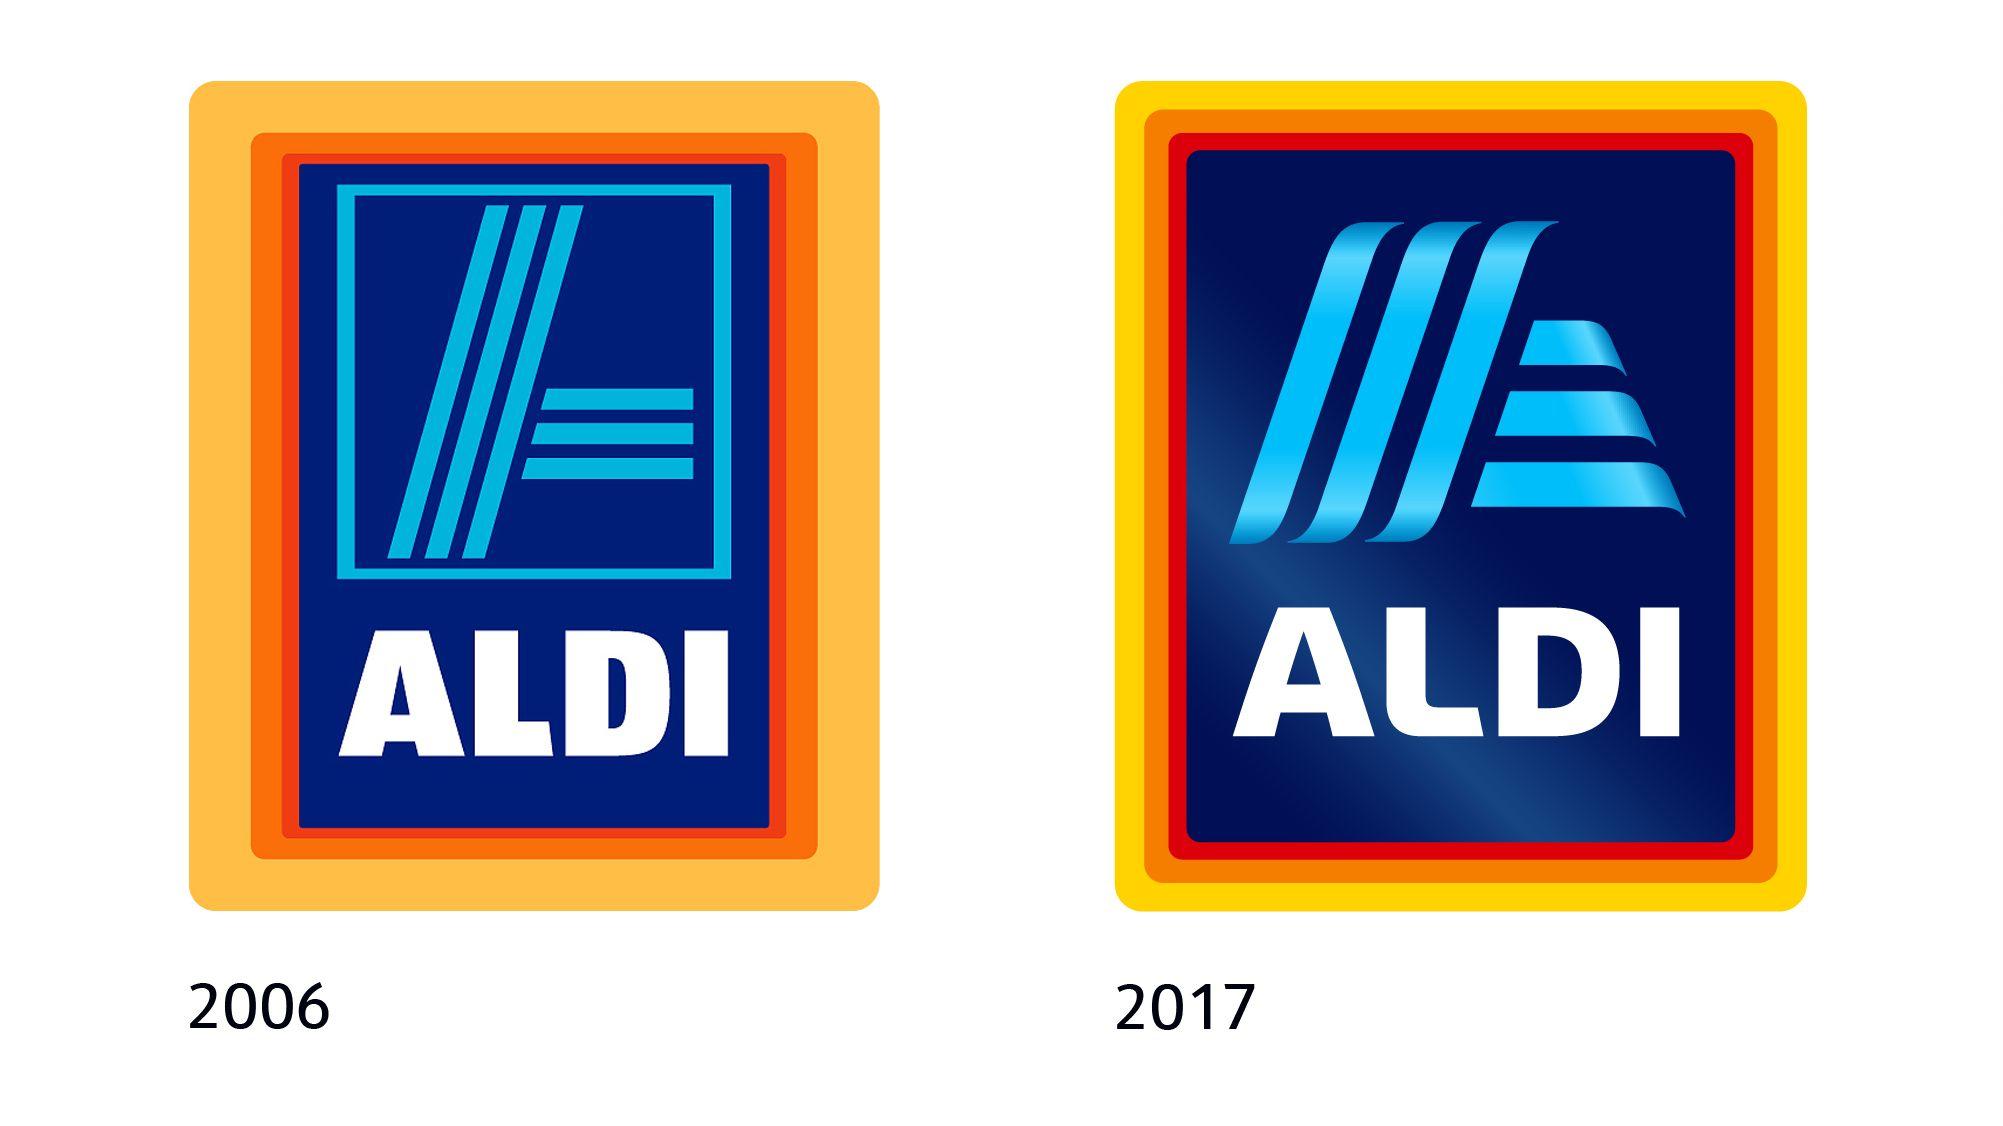 Design A Hat Aldi S 252 D Logo Design Experten Watschen Den Discounter Ab